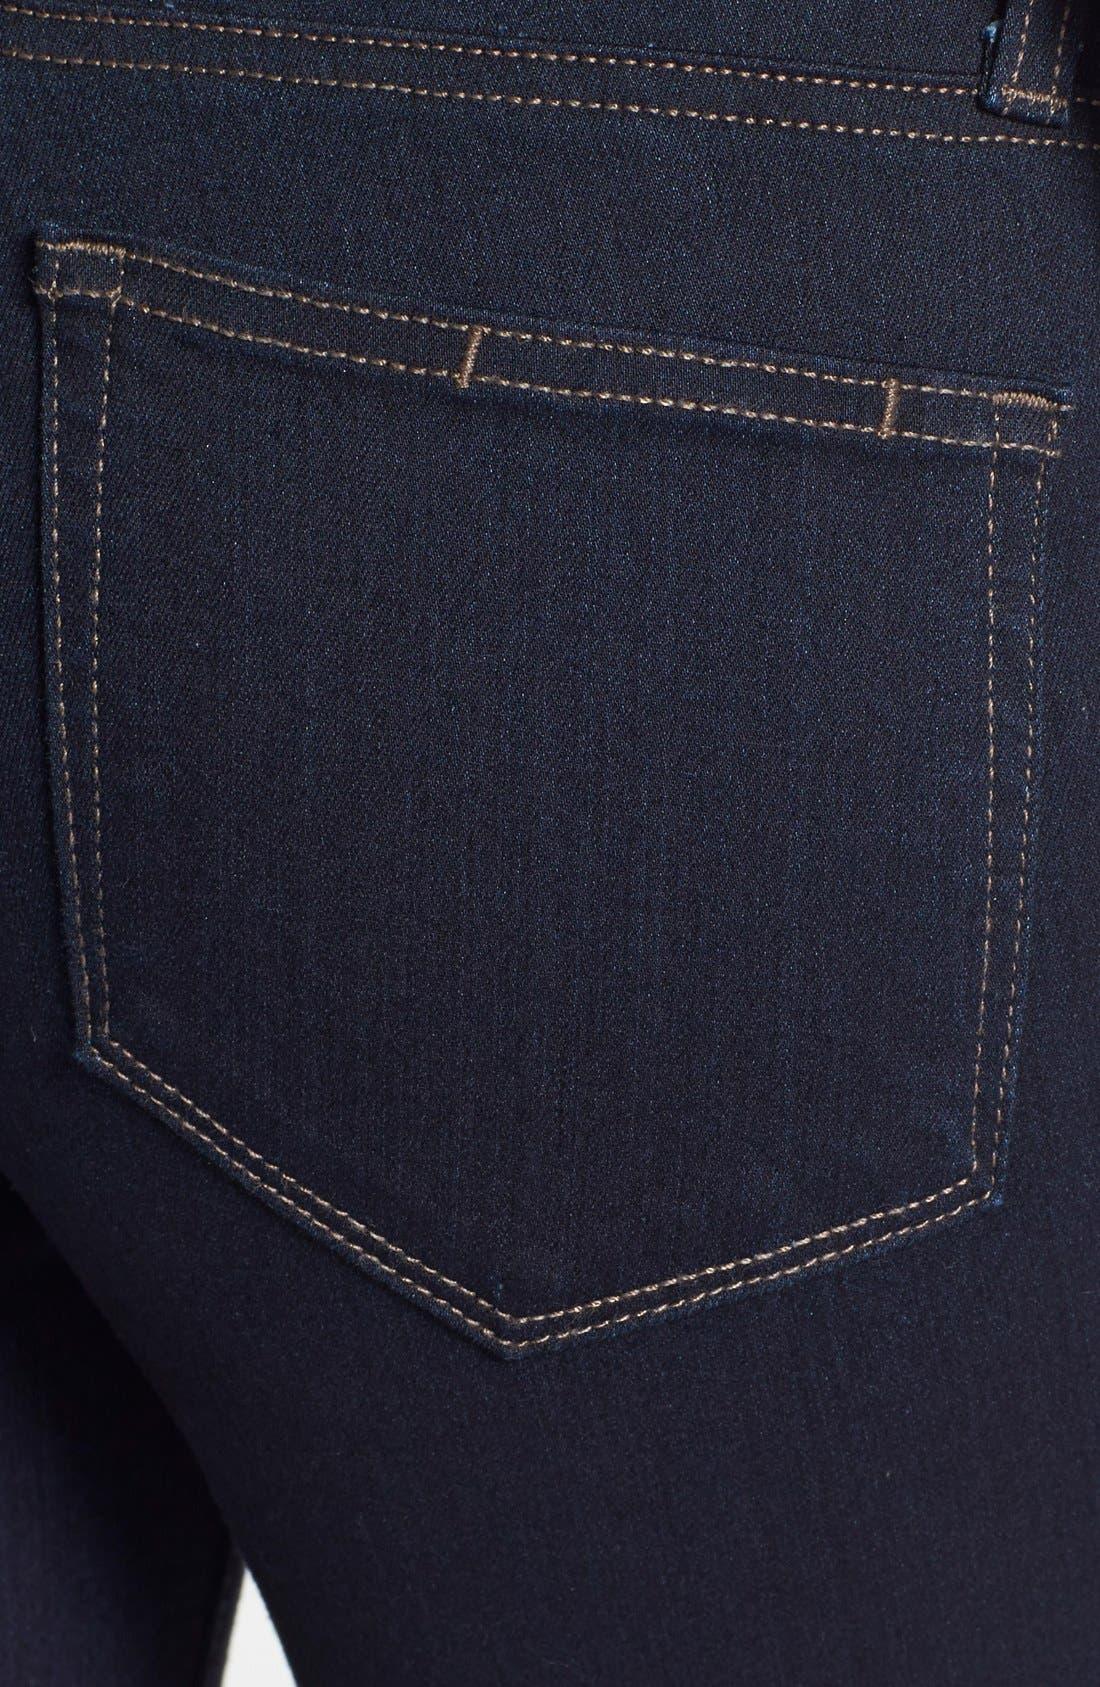 Denim 'Transcend - Hoxton' High Rise Ankle Jeans,                             Alternate thumbnail 3, color,                             001